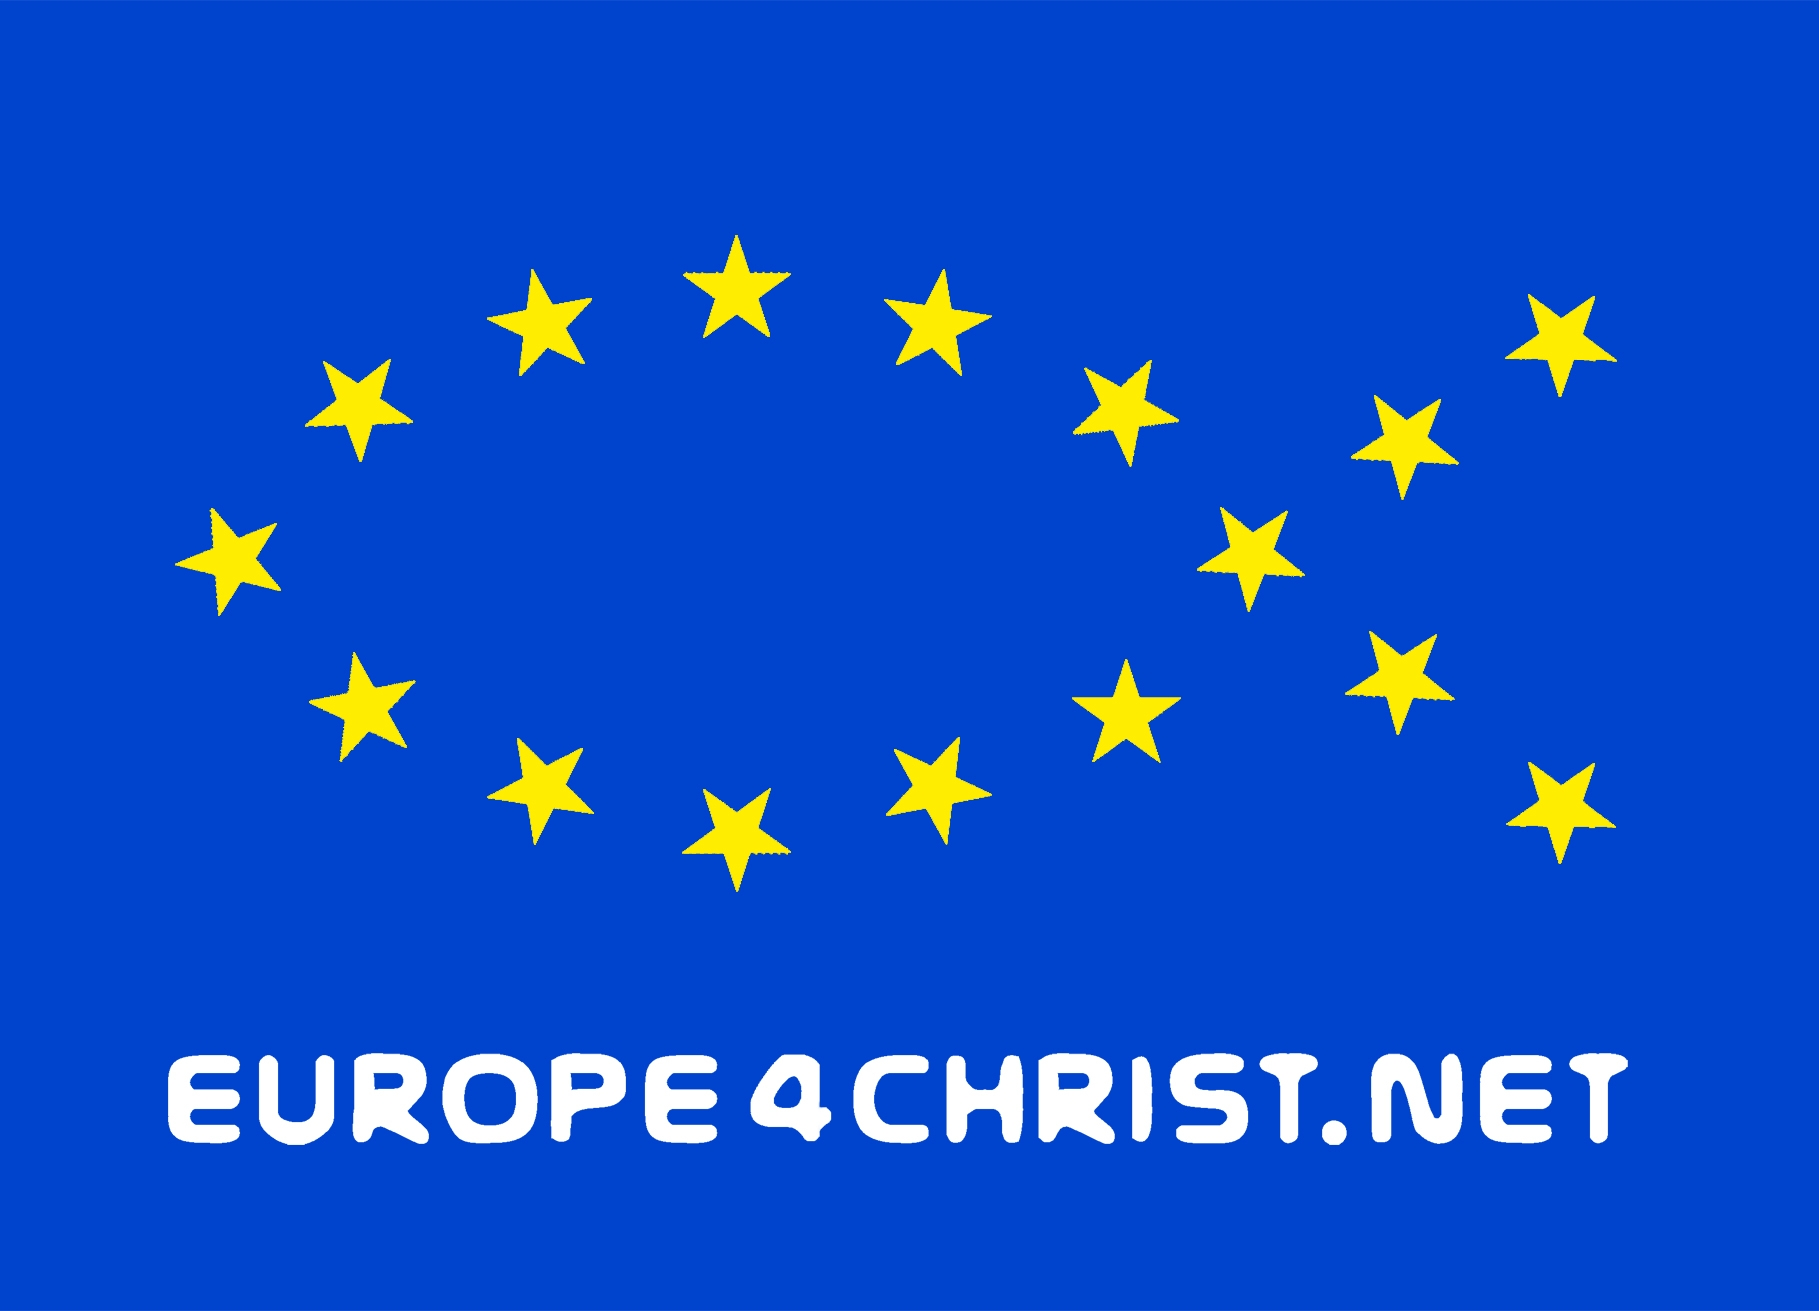 Europa dla Chrystusa